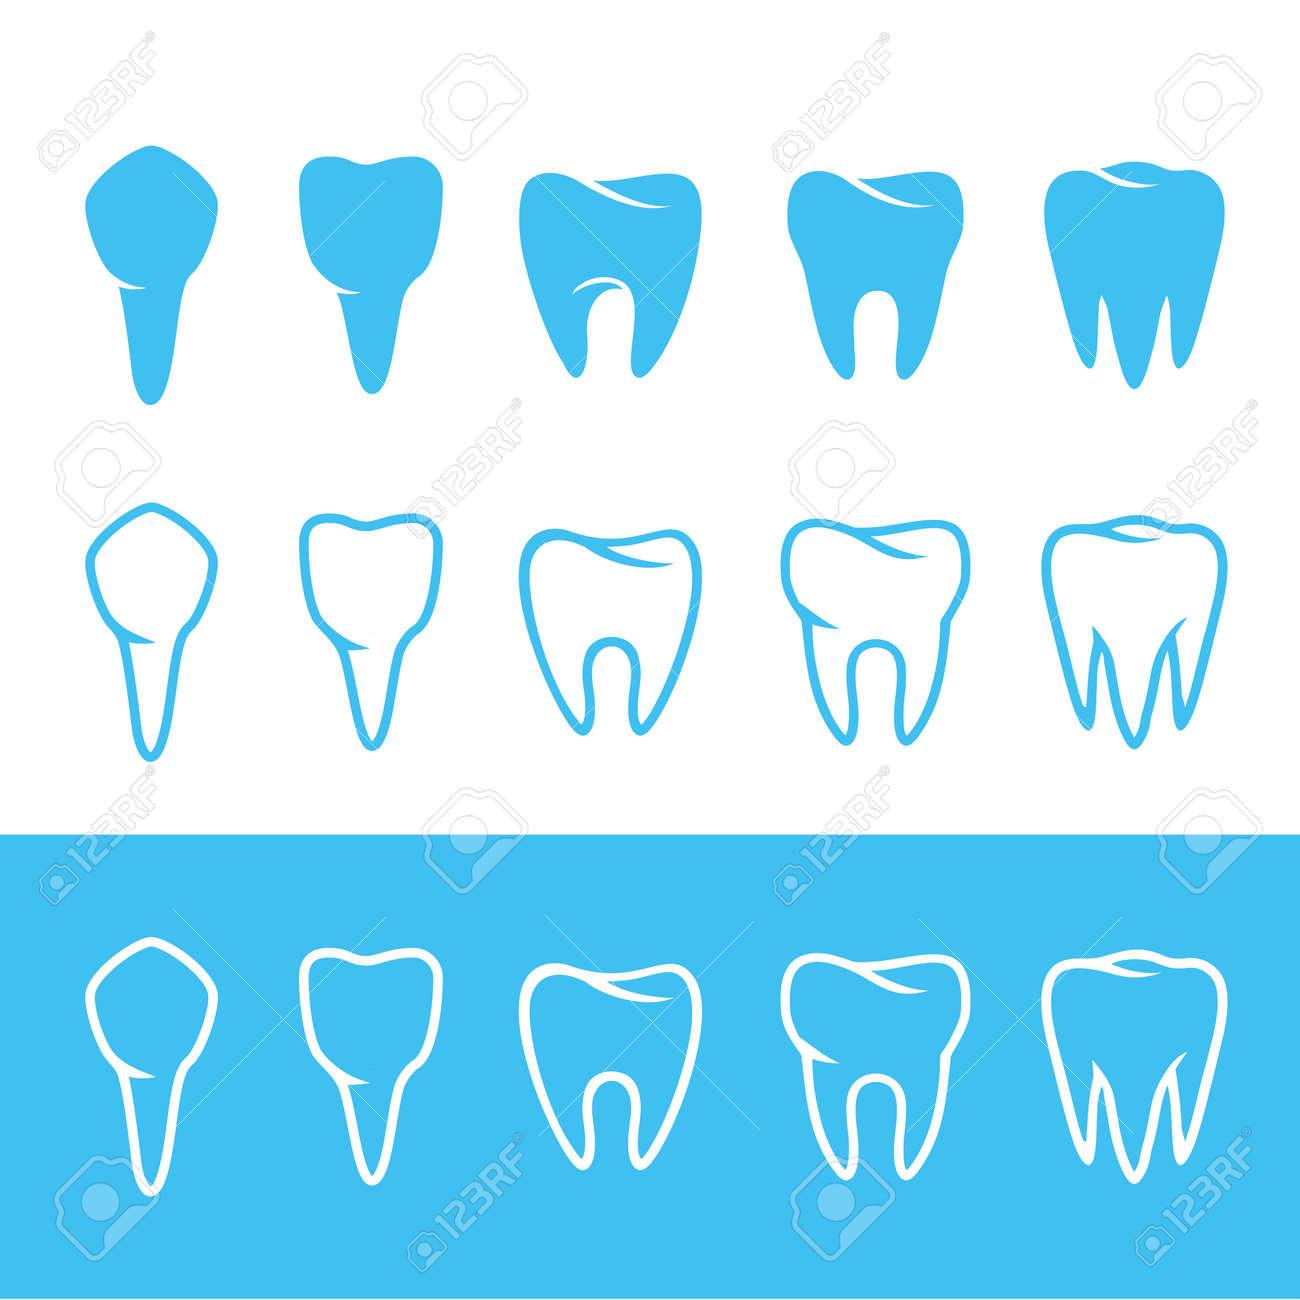 Human dentition teeth human tooth anatomy chart diagram teeth human dentition teeth human tooth anatomy chart diagram teeth illustration imagens 67563633 ccuart Gallery